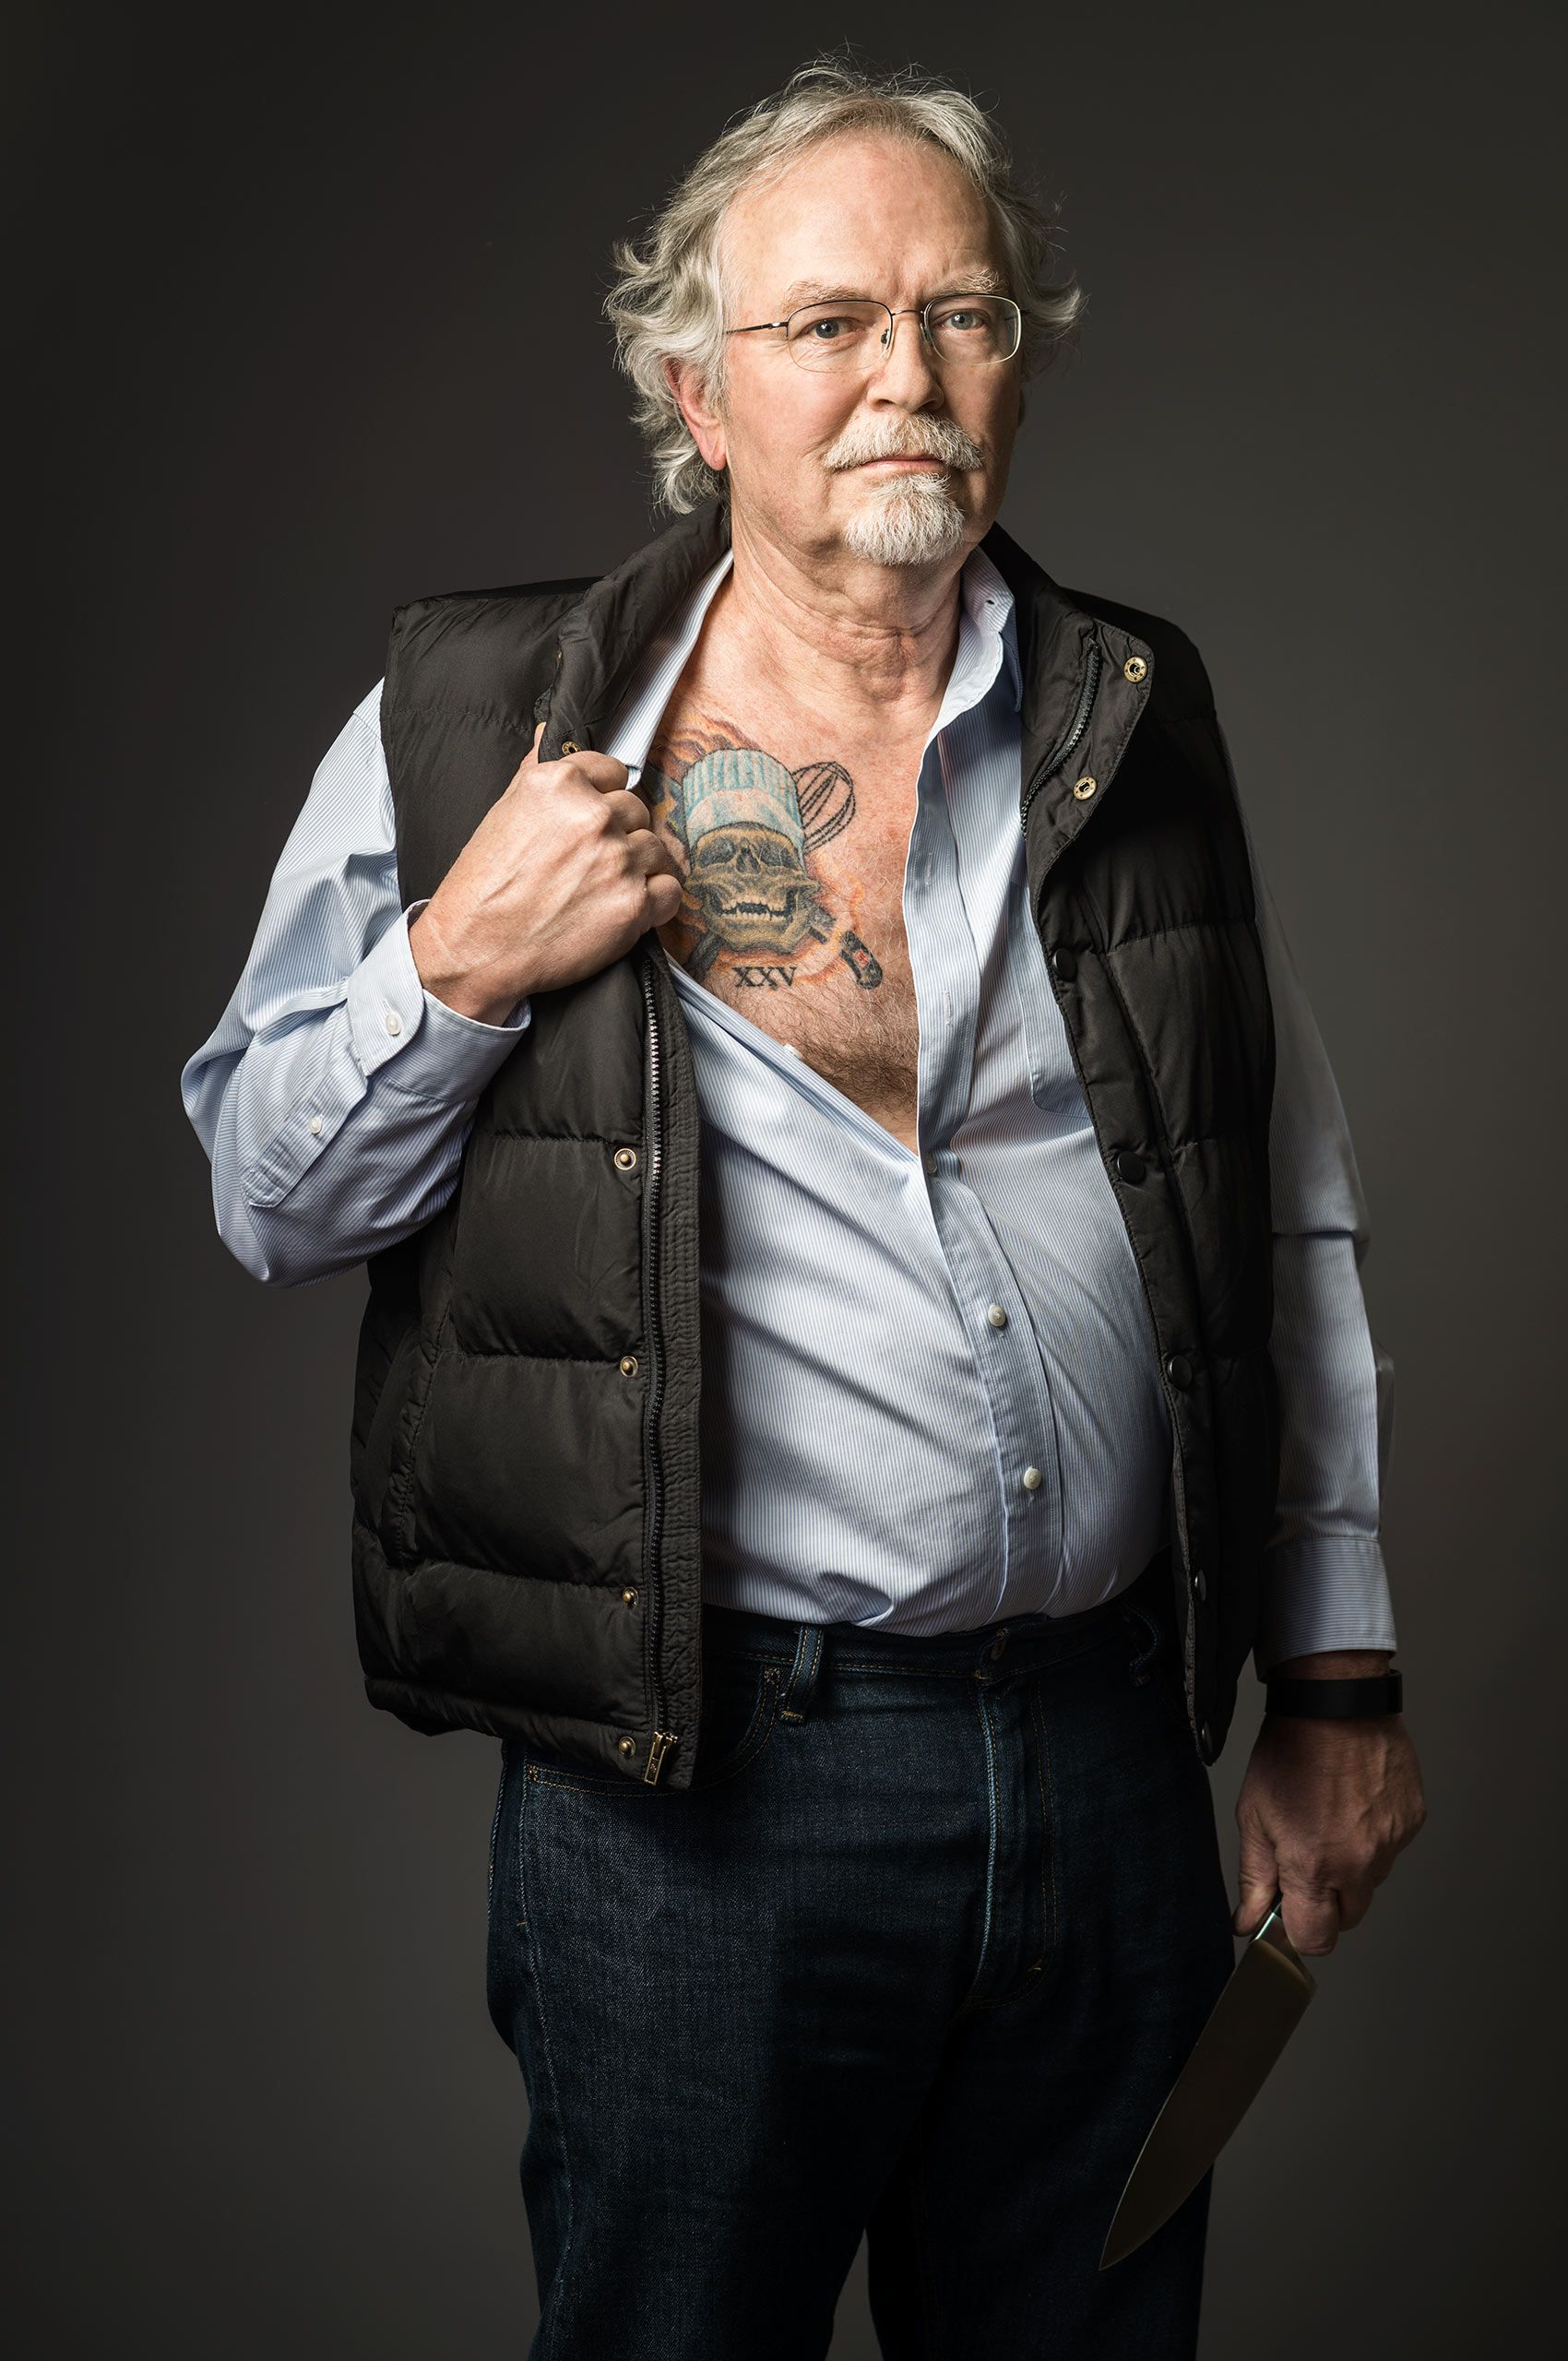 man-showing-tattooo-by-HenrikOlundPhotography.jpg